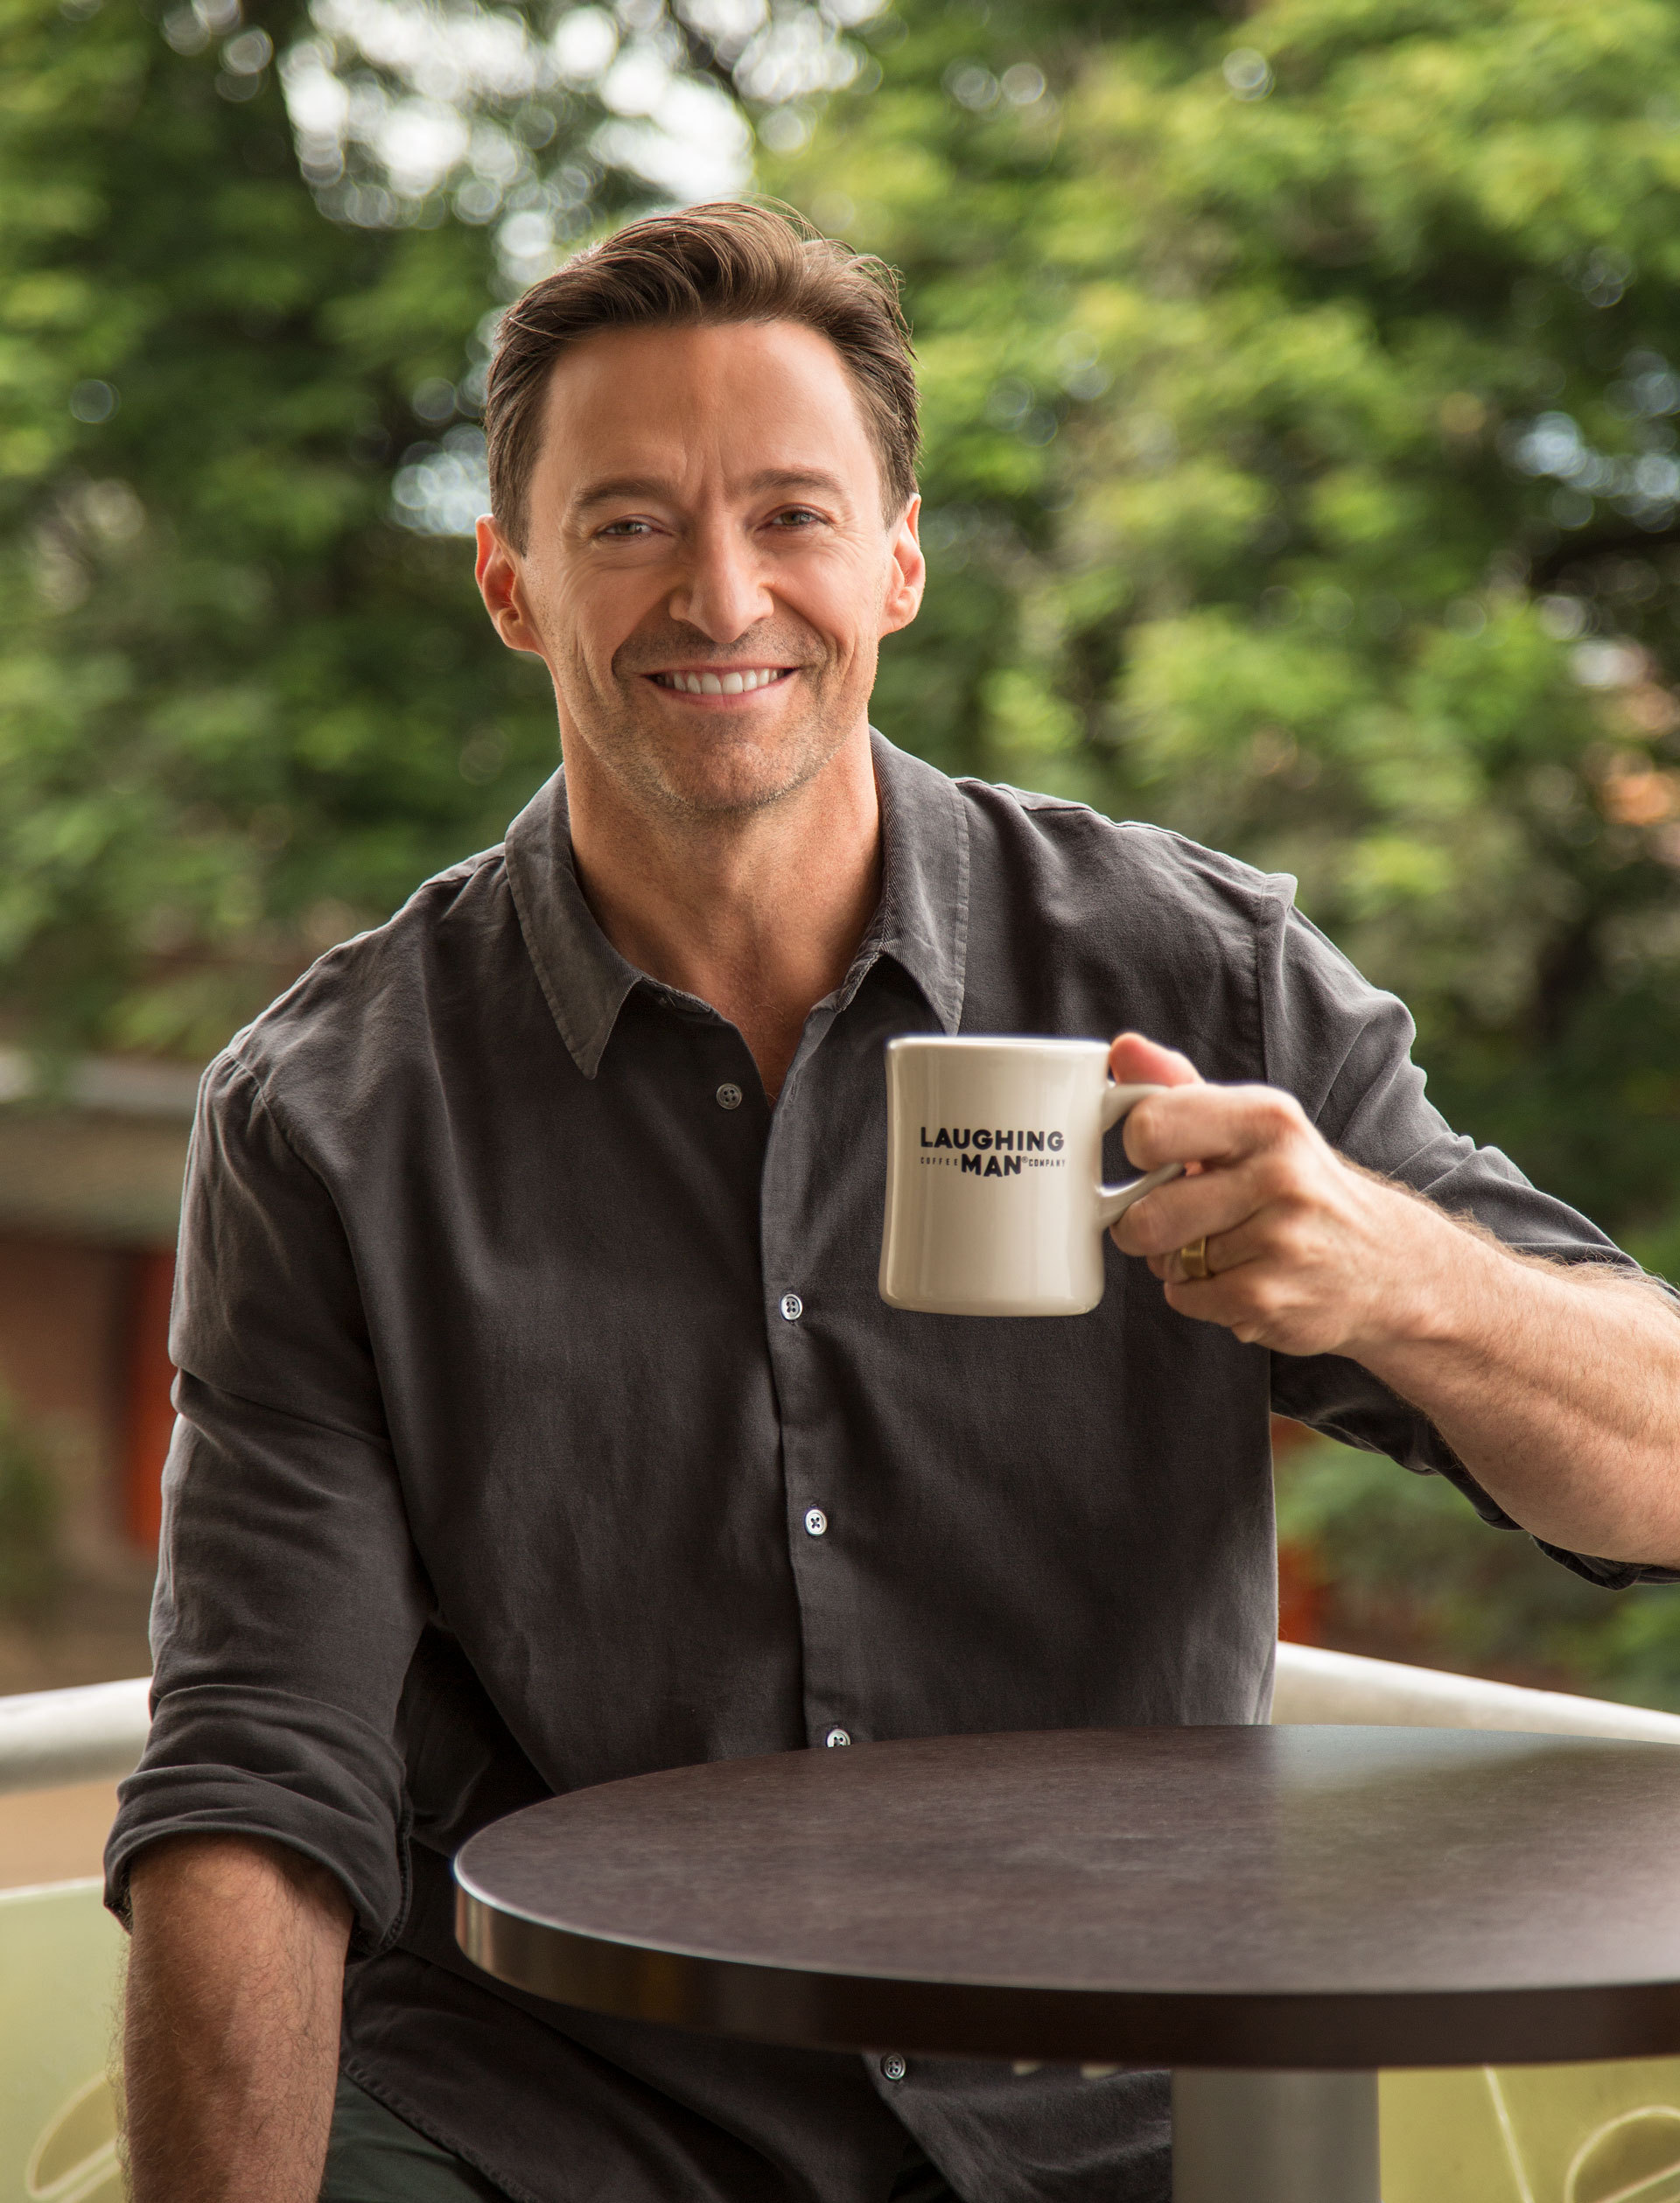 актеры пьют кофе картинки поспорили